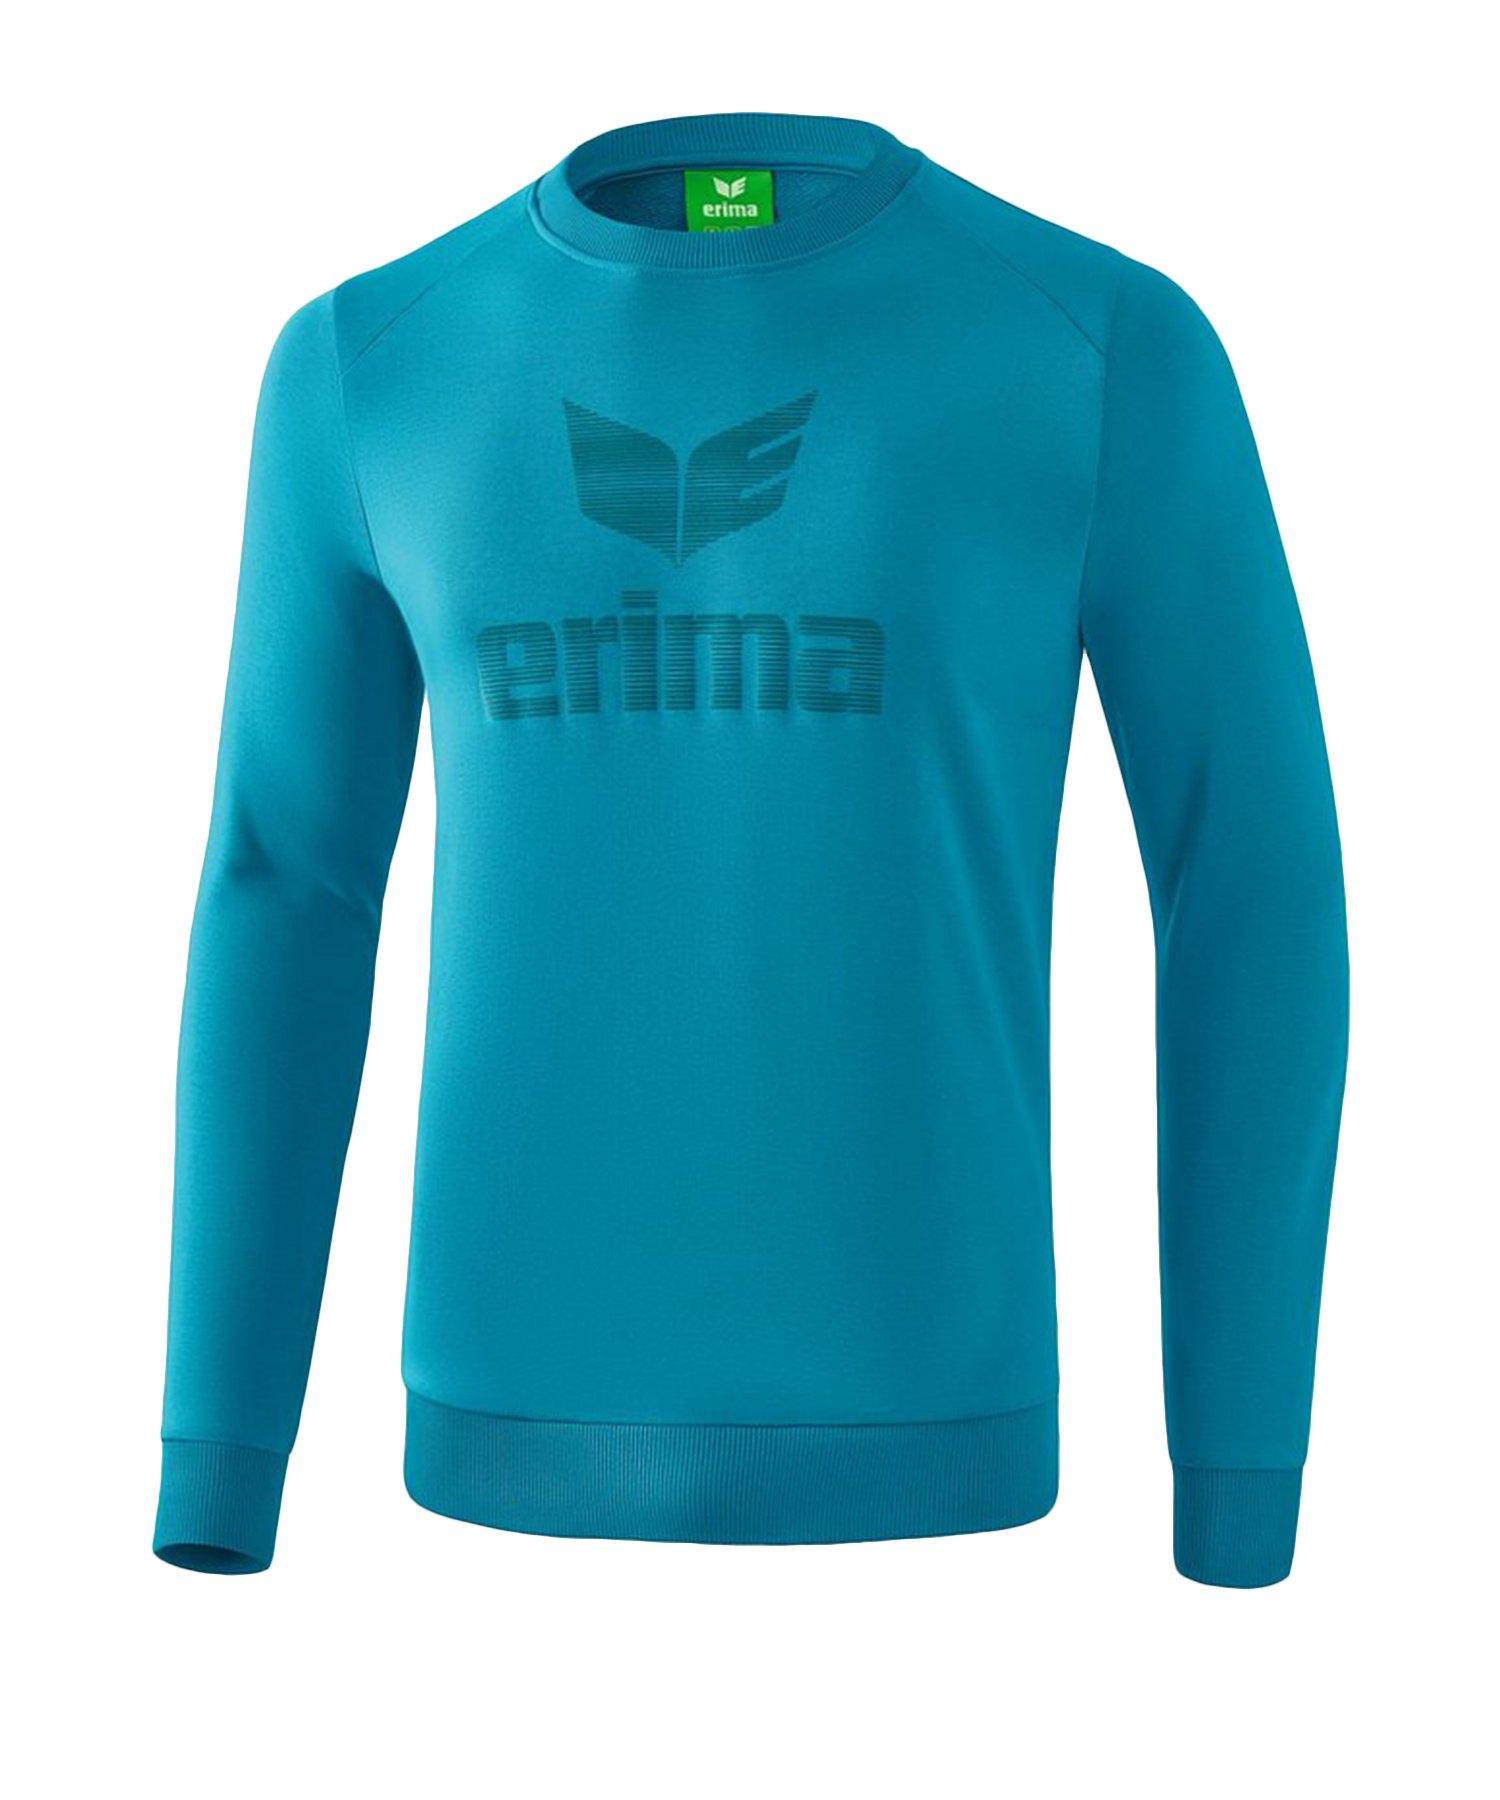 Erima Essential Sweatshirt Kids Blau - Blau